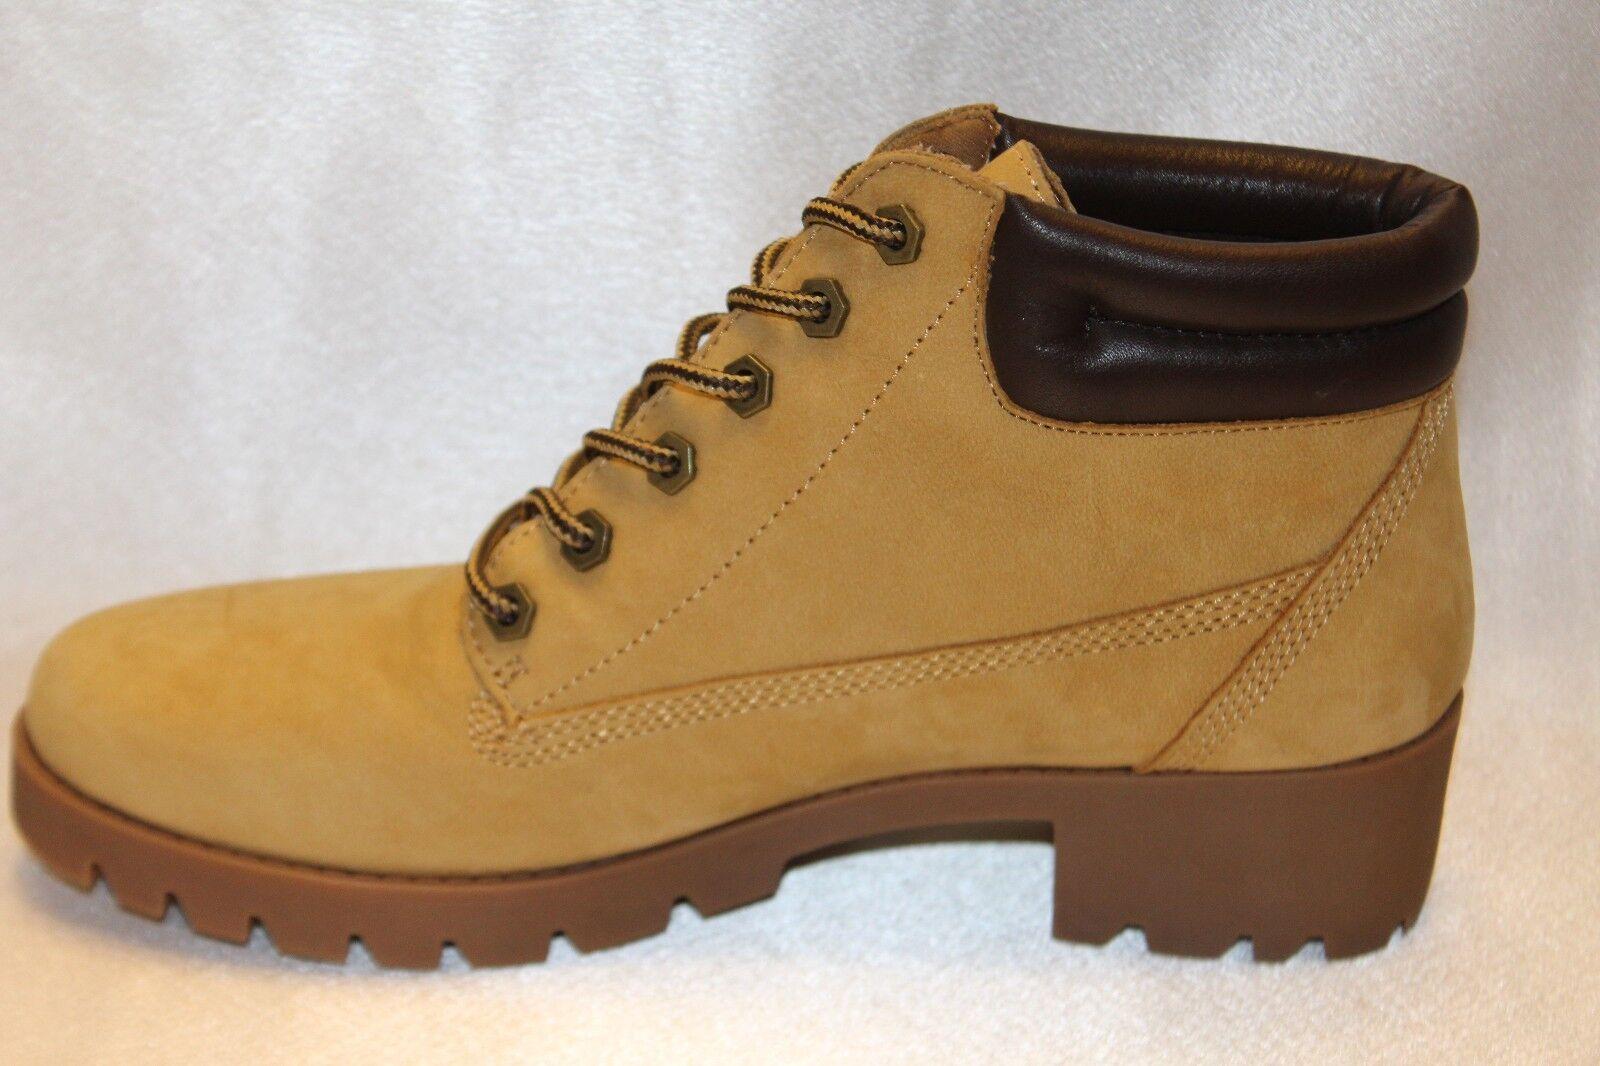 NEW Light  ALDO Soft Light NEW Tan Leder MUTIGNANO Hiking Padded Ankle Boot Sz 9.5 9c1b6b